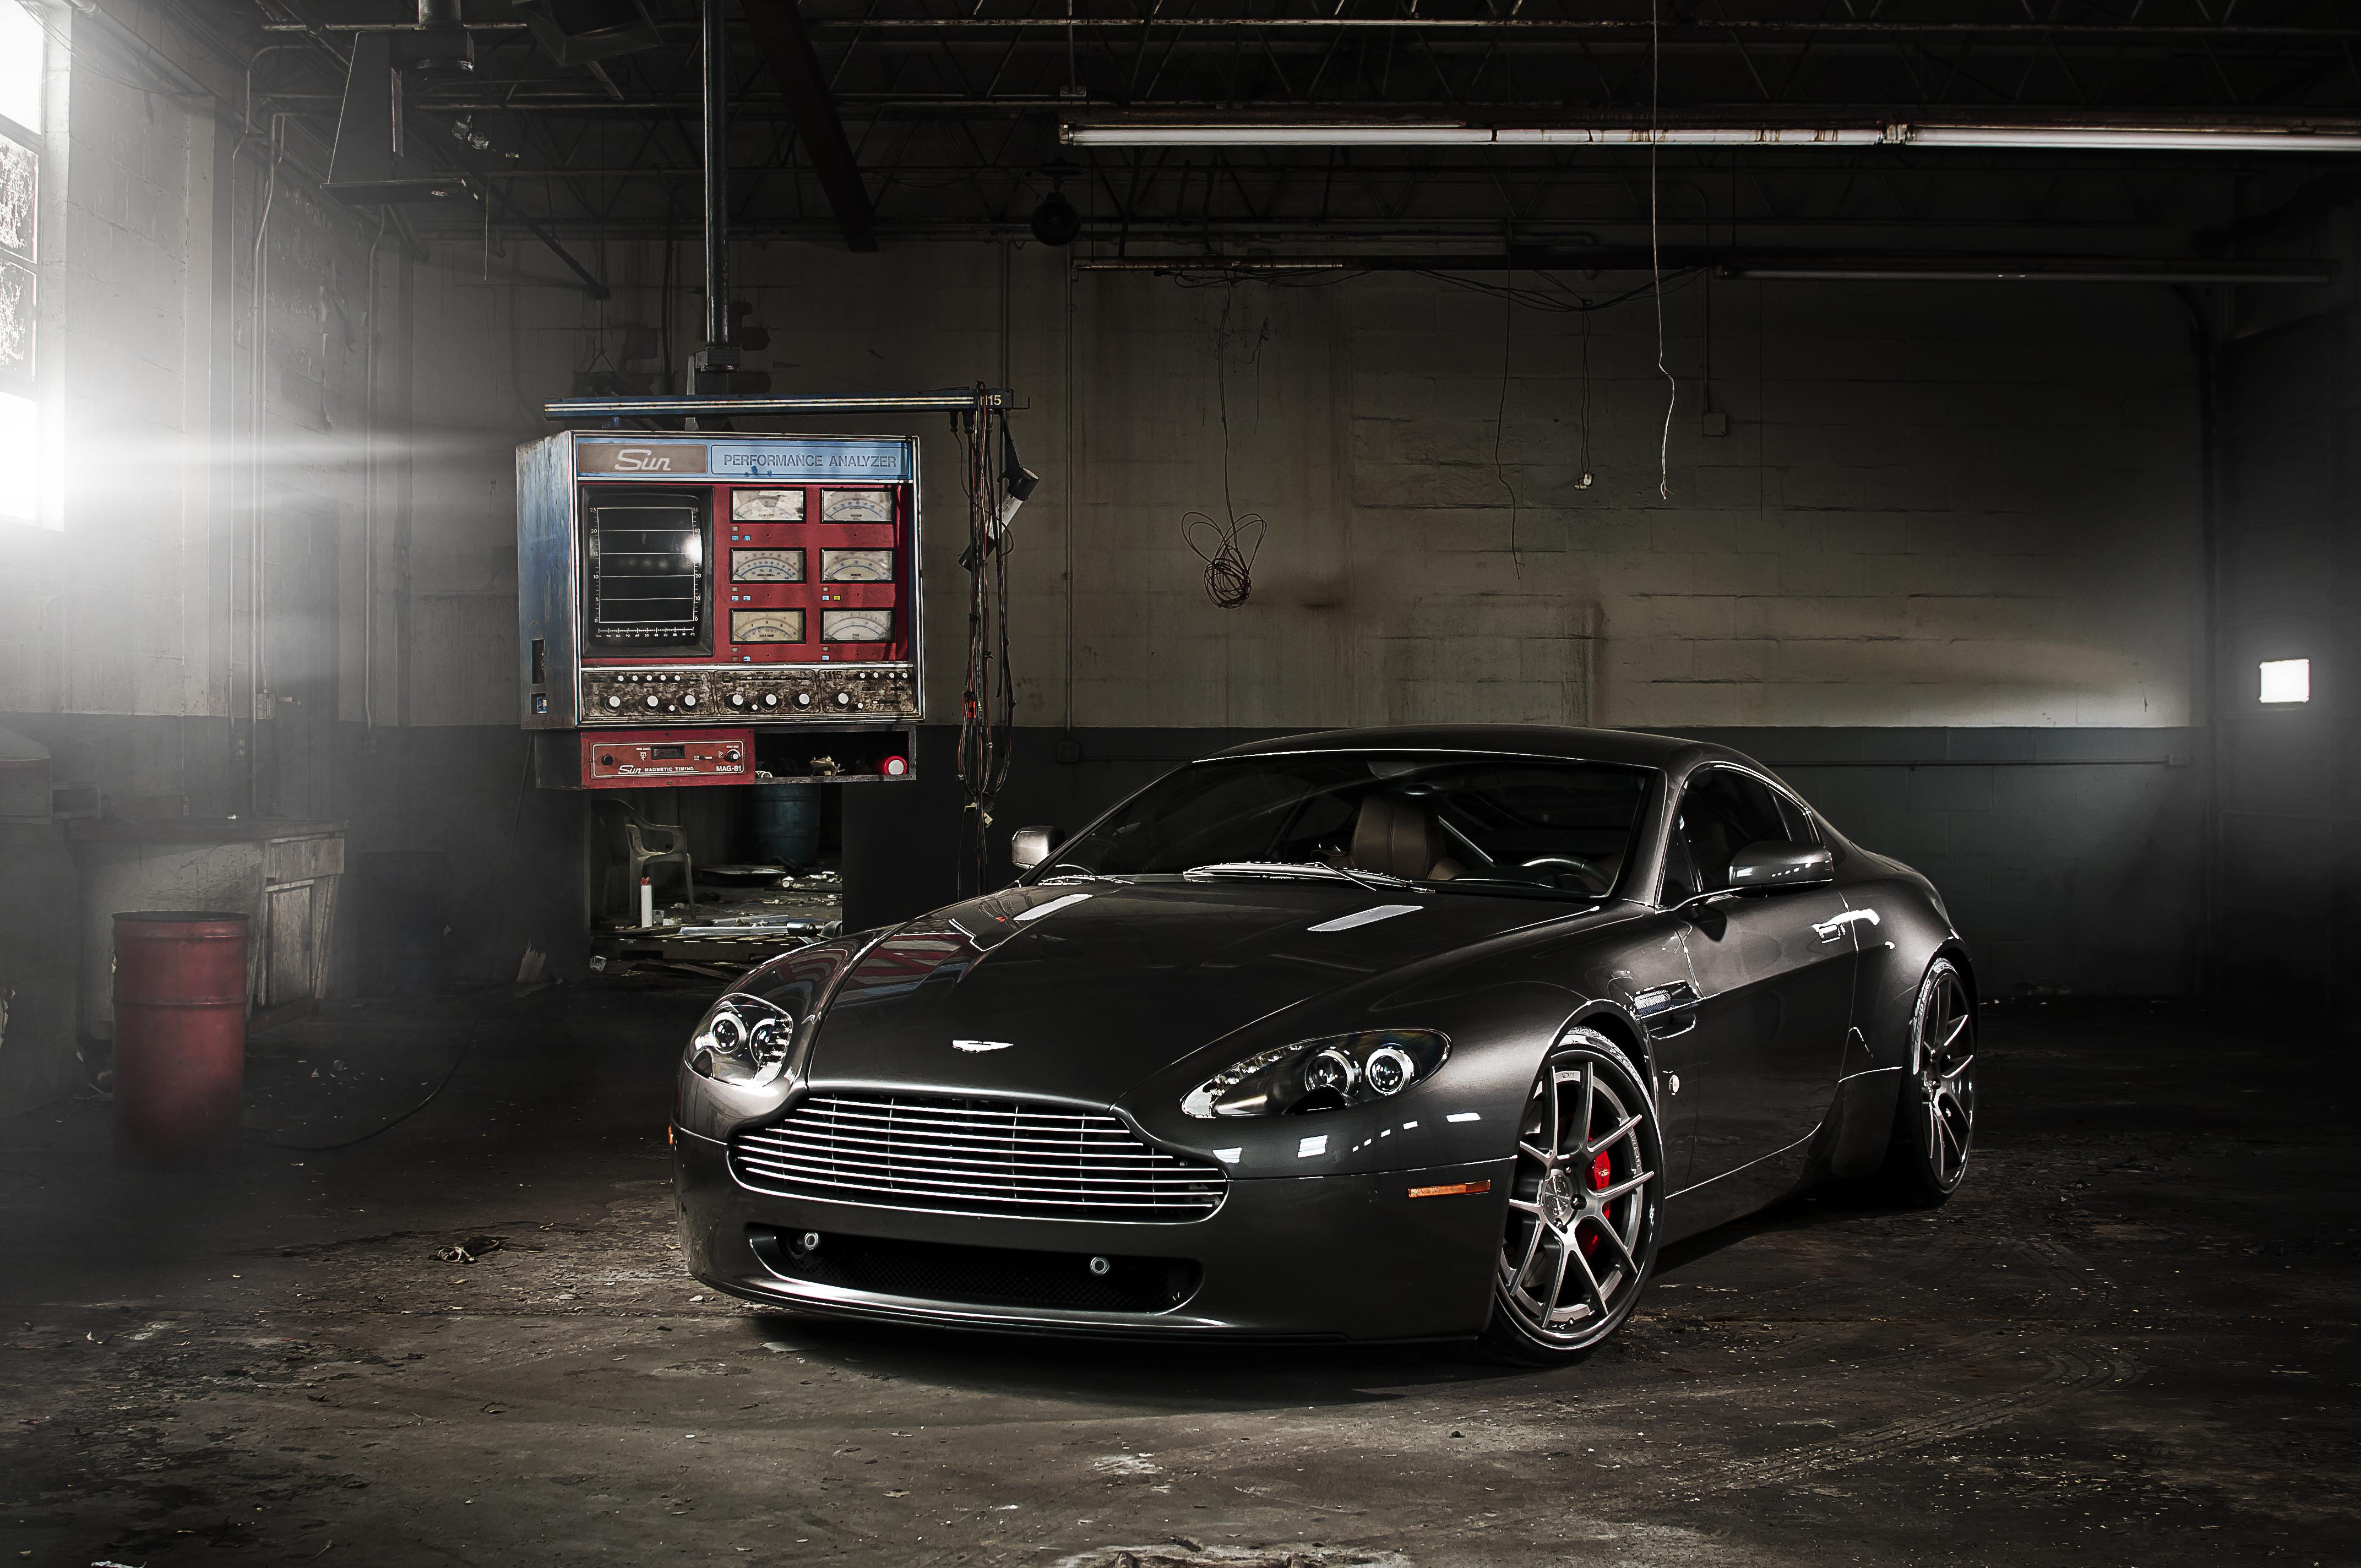 Aston Martin V8 Vantage 4k Ultra HD Wallpaper Background Image 4288x2848